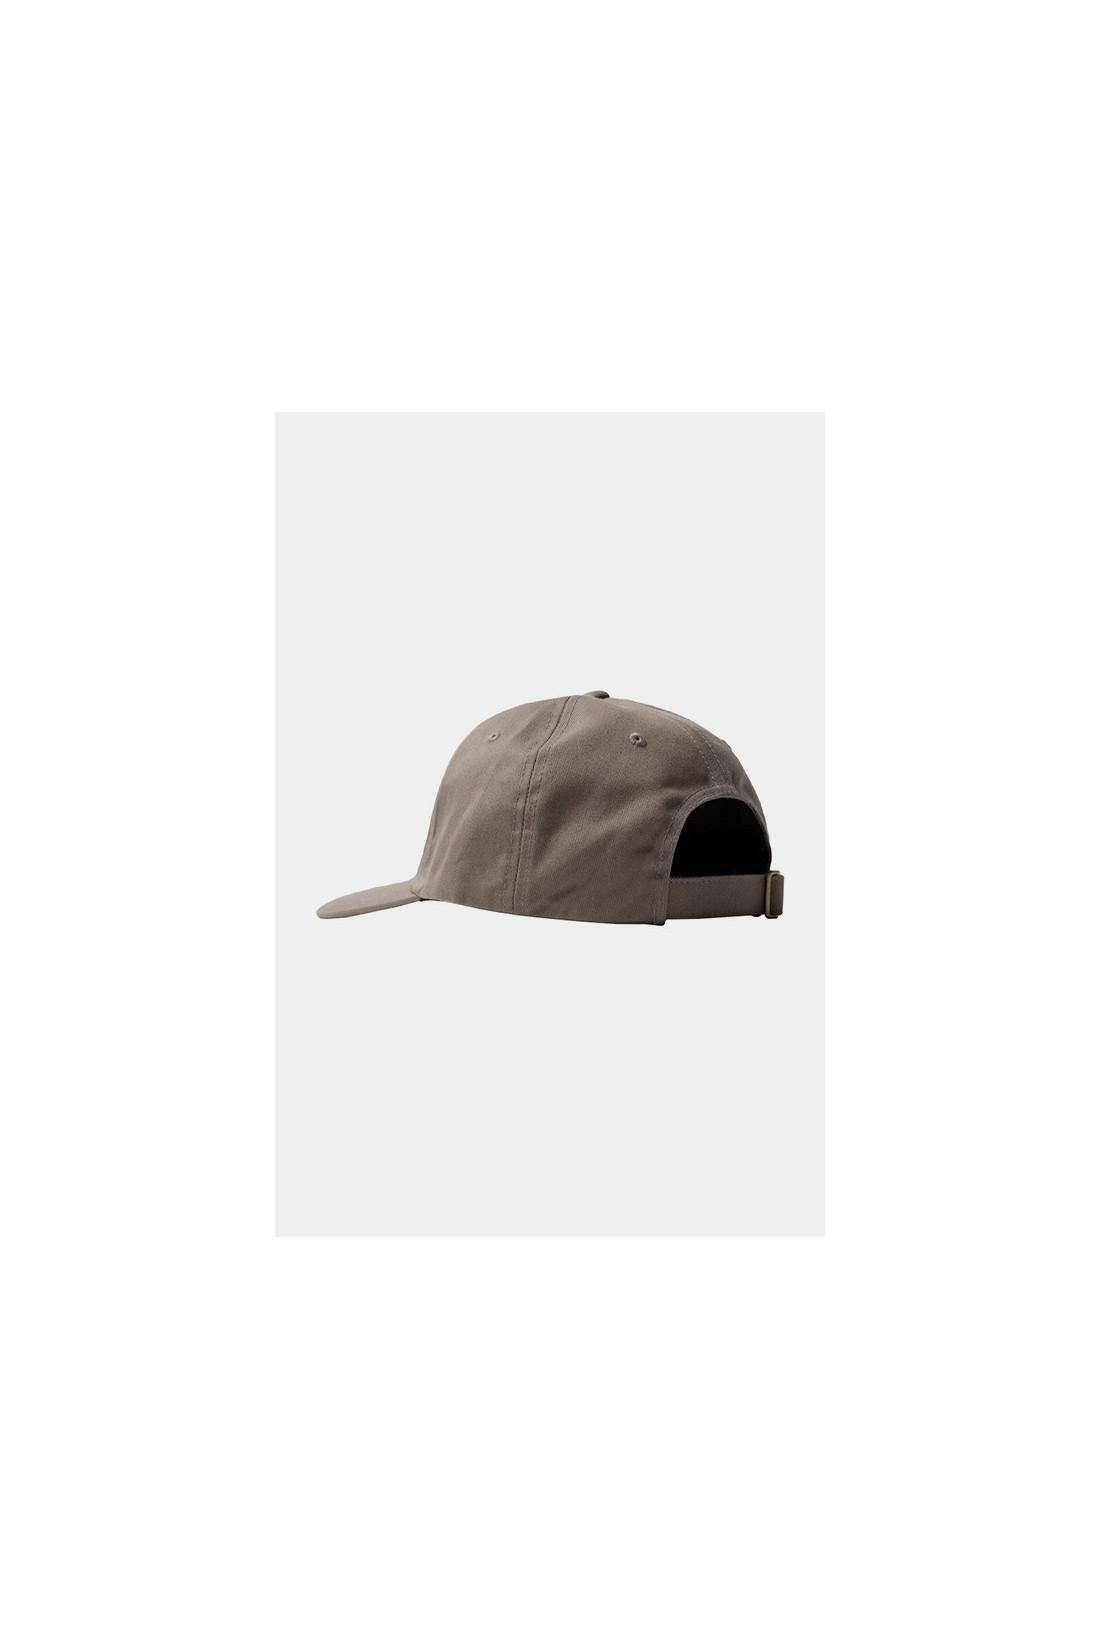 STUSSY / Stock low pro cap Khaki